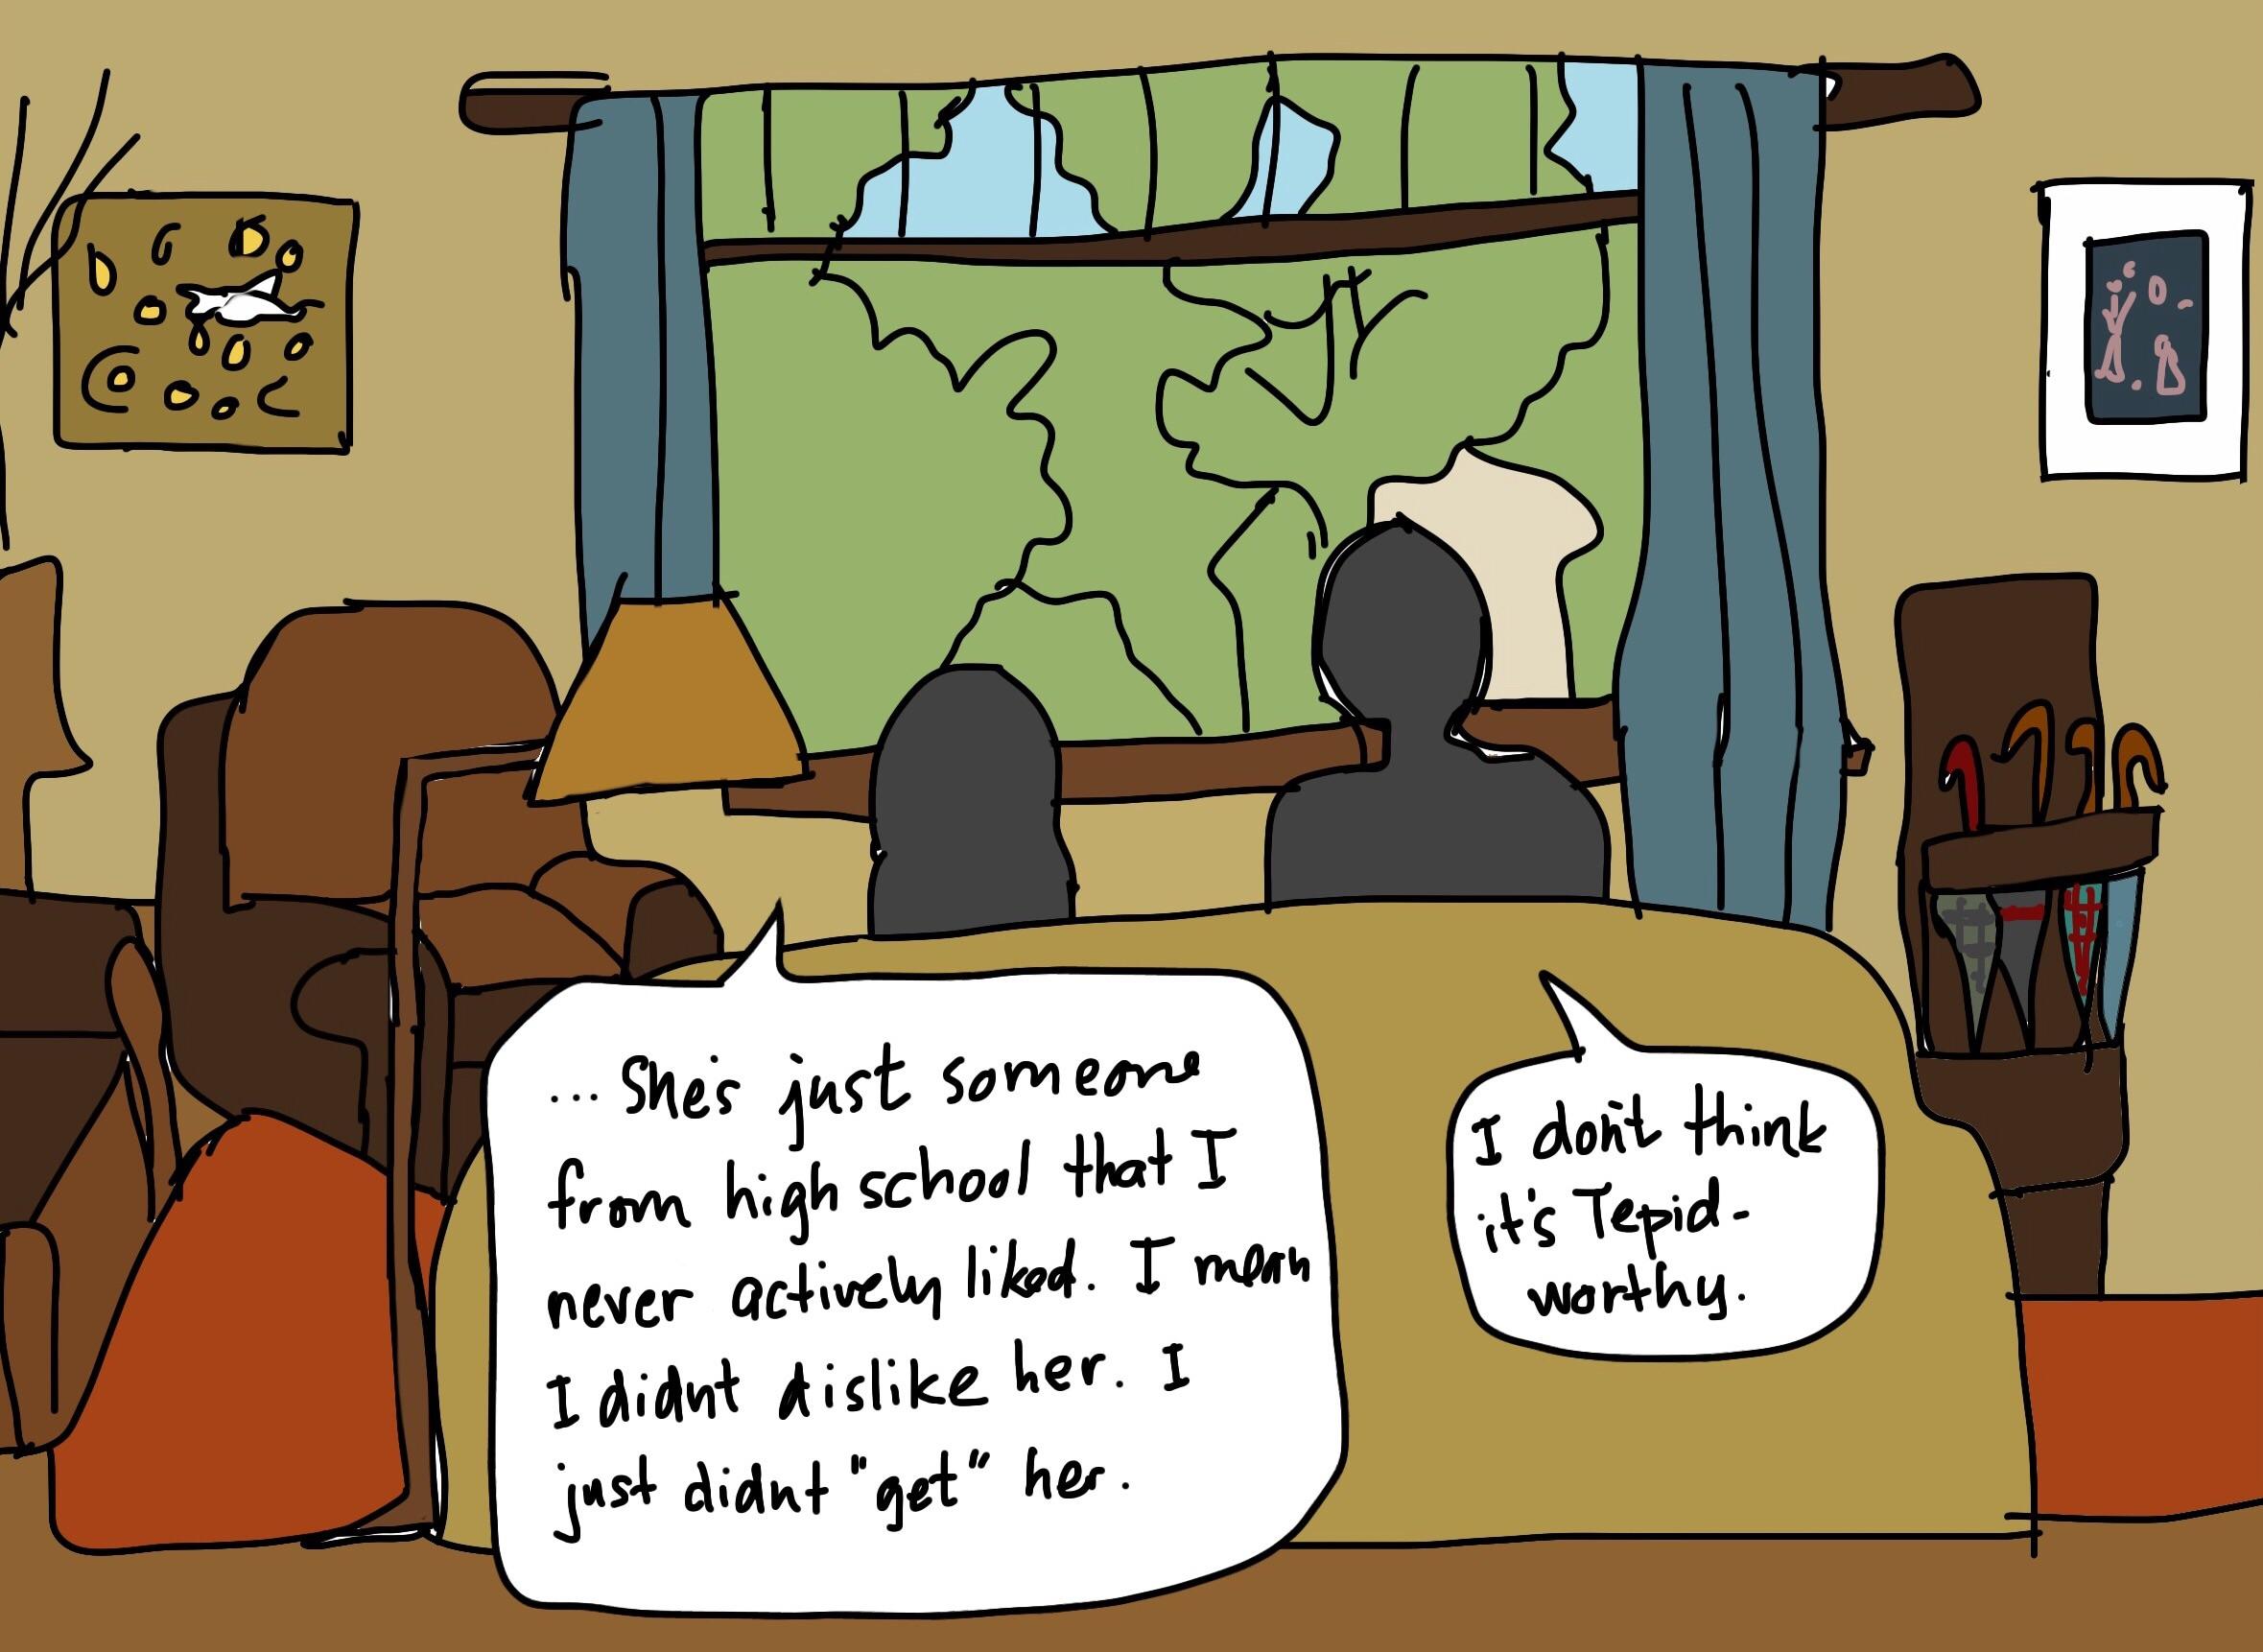 Unworthy, Self-Referential Cartoons Didn't Get Drawn as Well